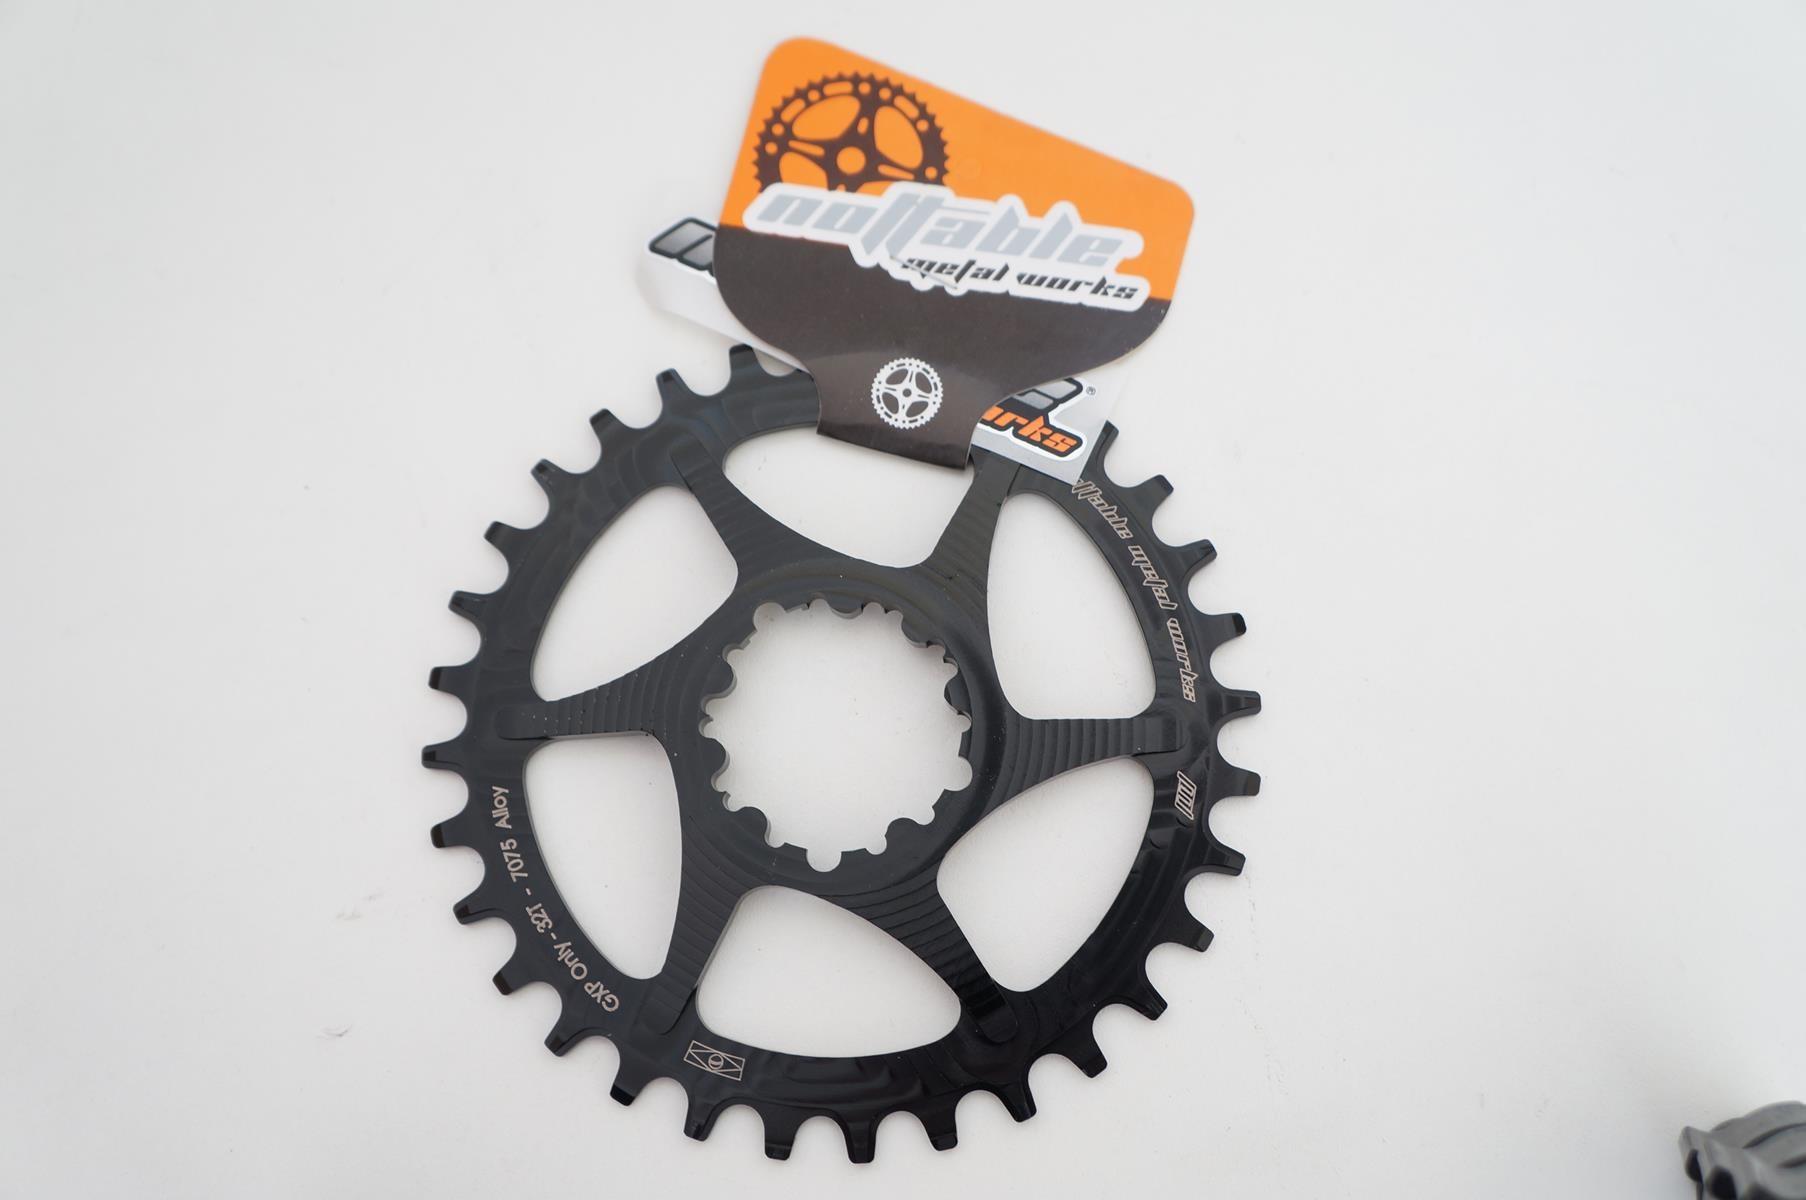 Coroa Bicicleta Nottable para Sram GXP 32t Direct Mount 6mm Off Set Para Uso 1x11